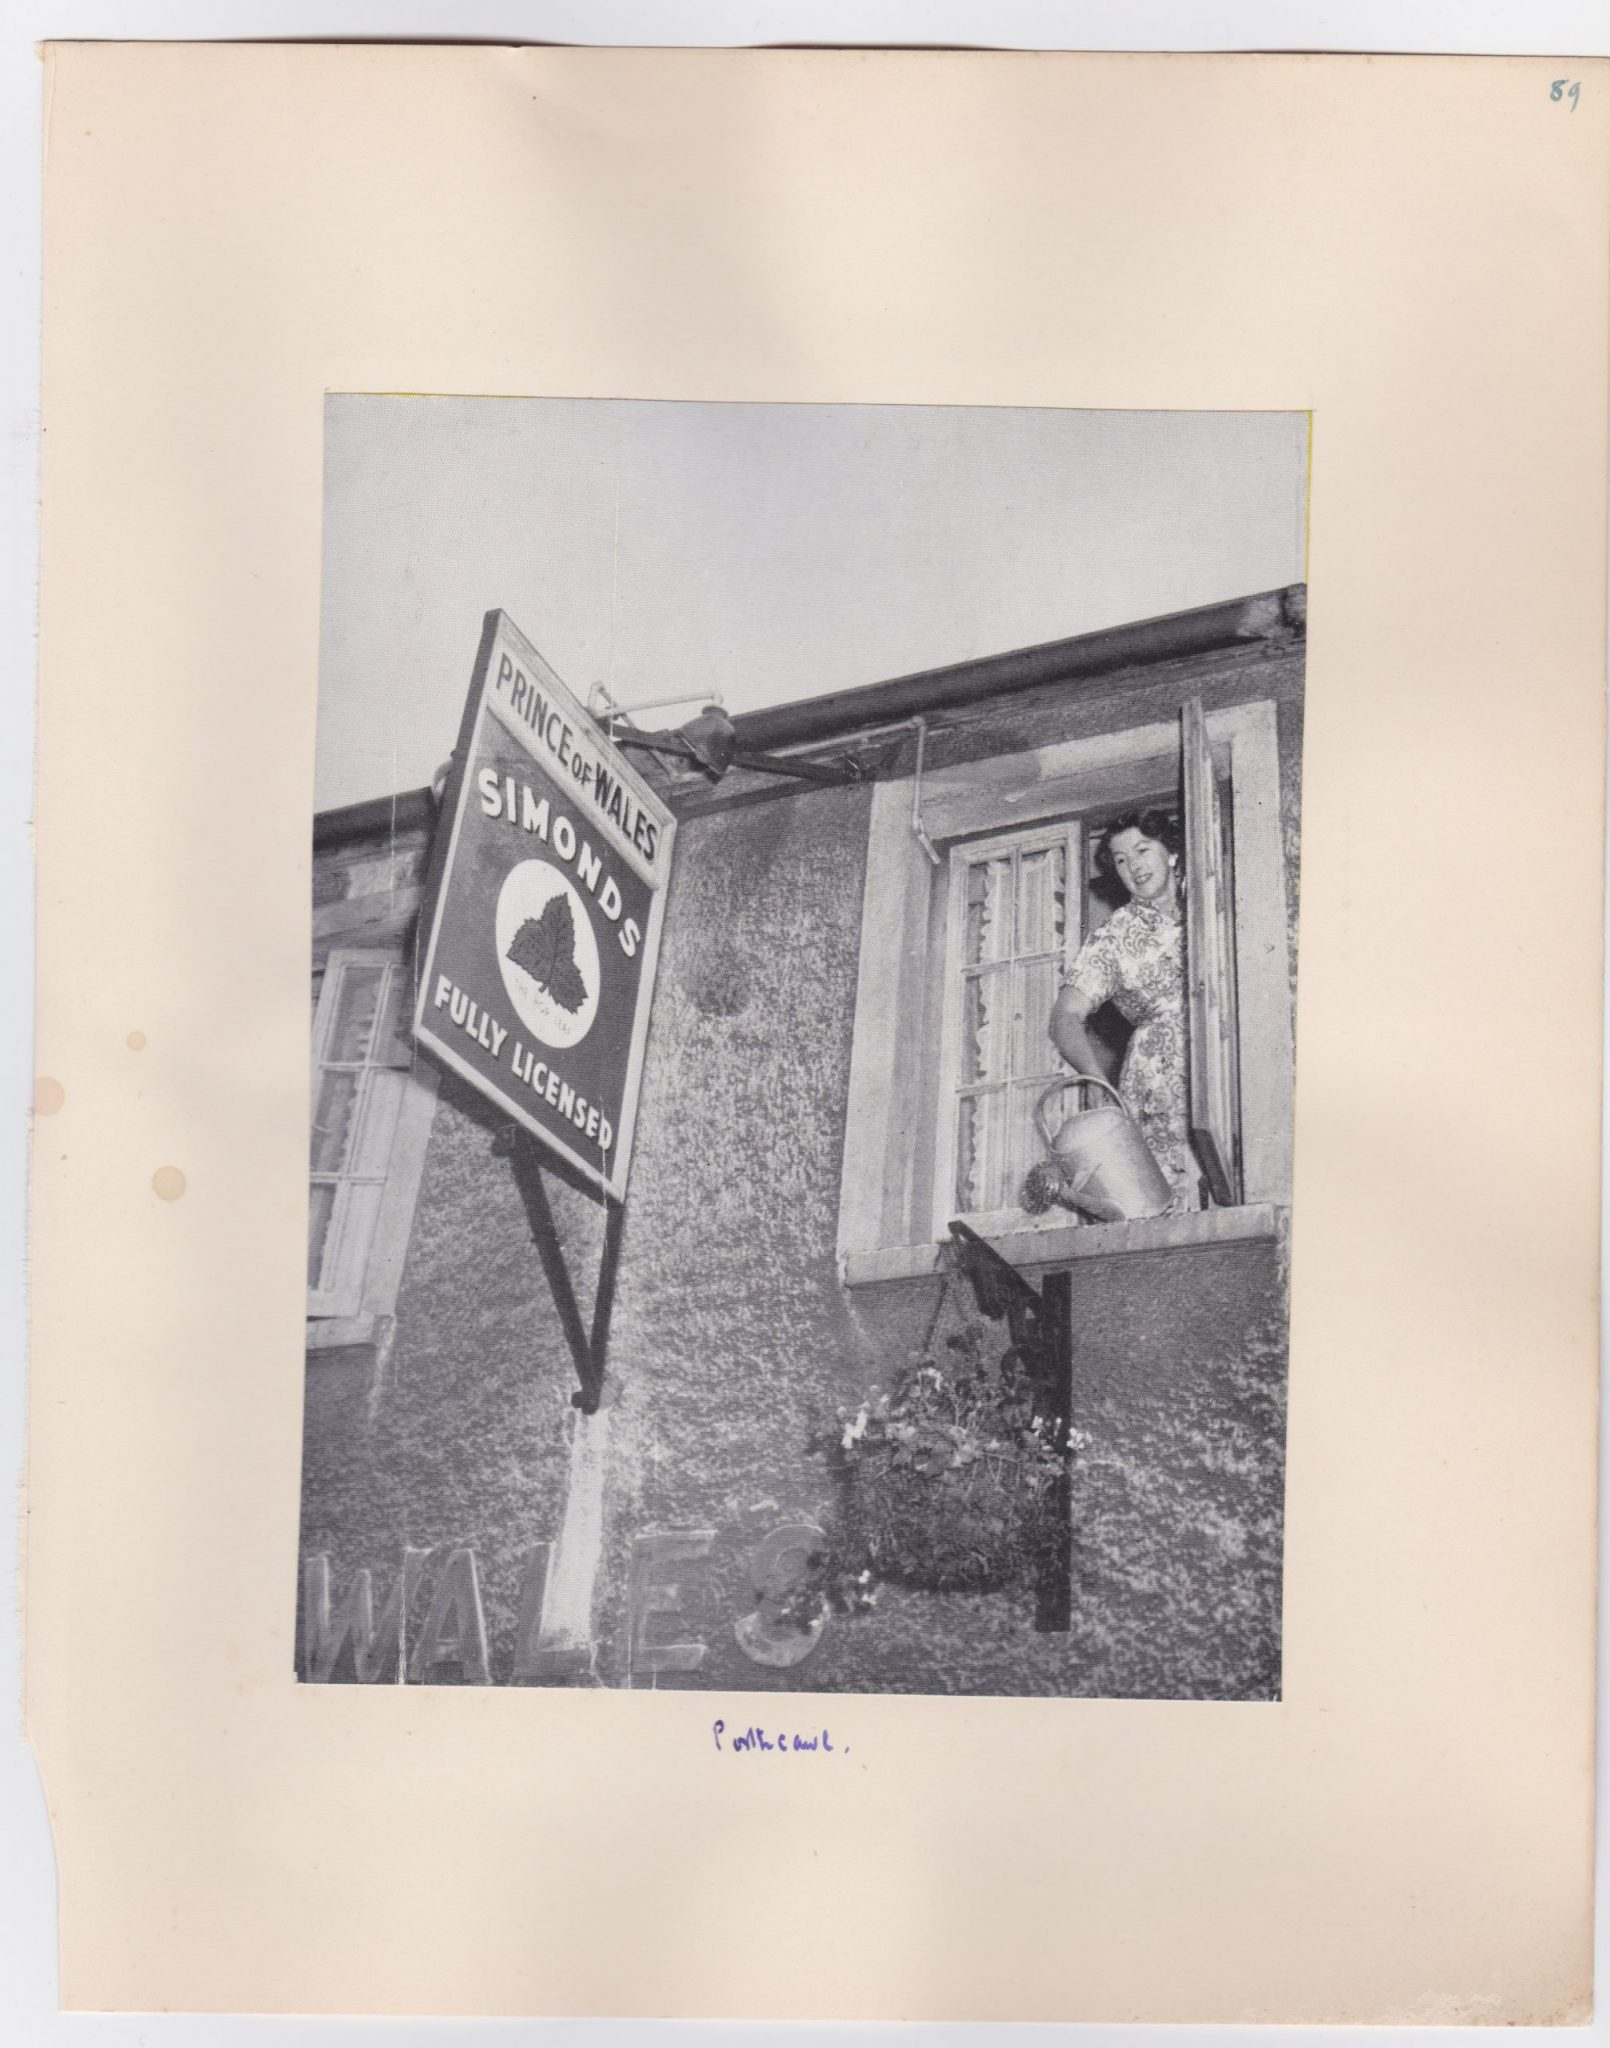 A Pub History Scrapbook Archive 36